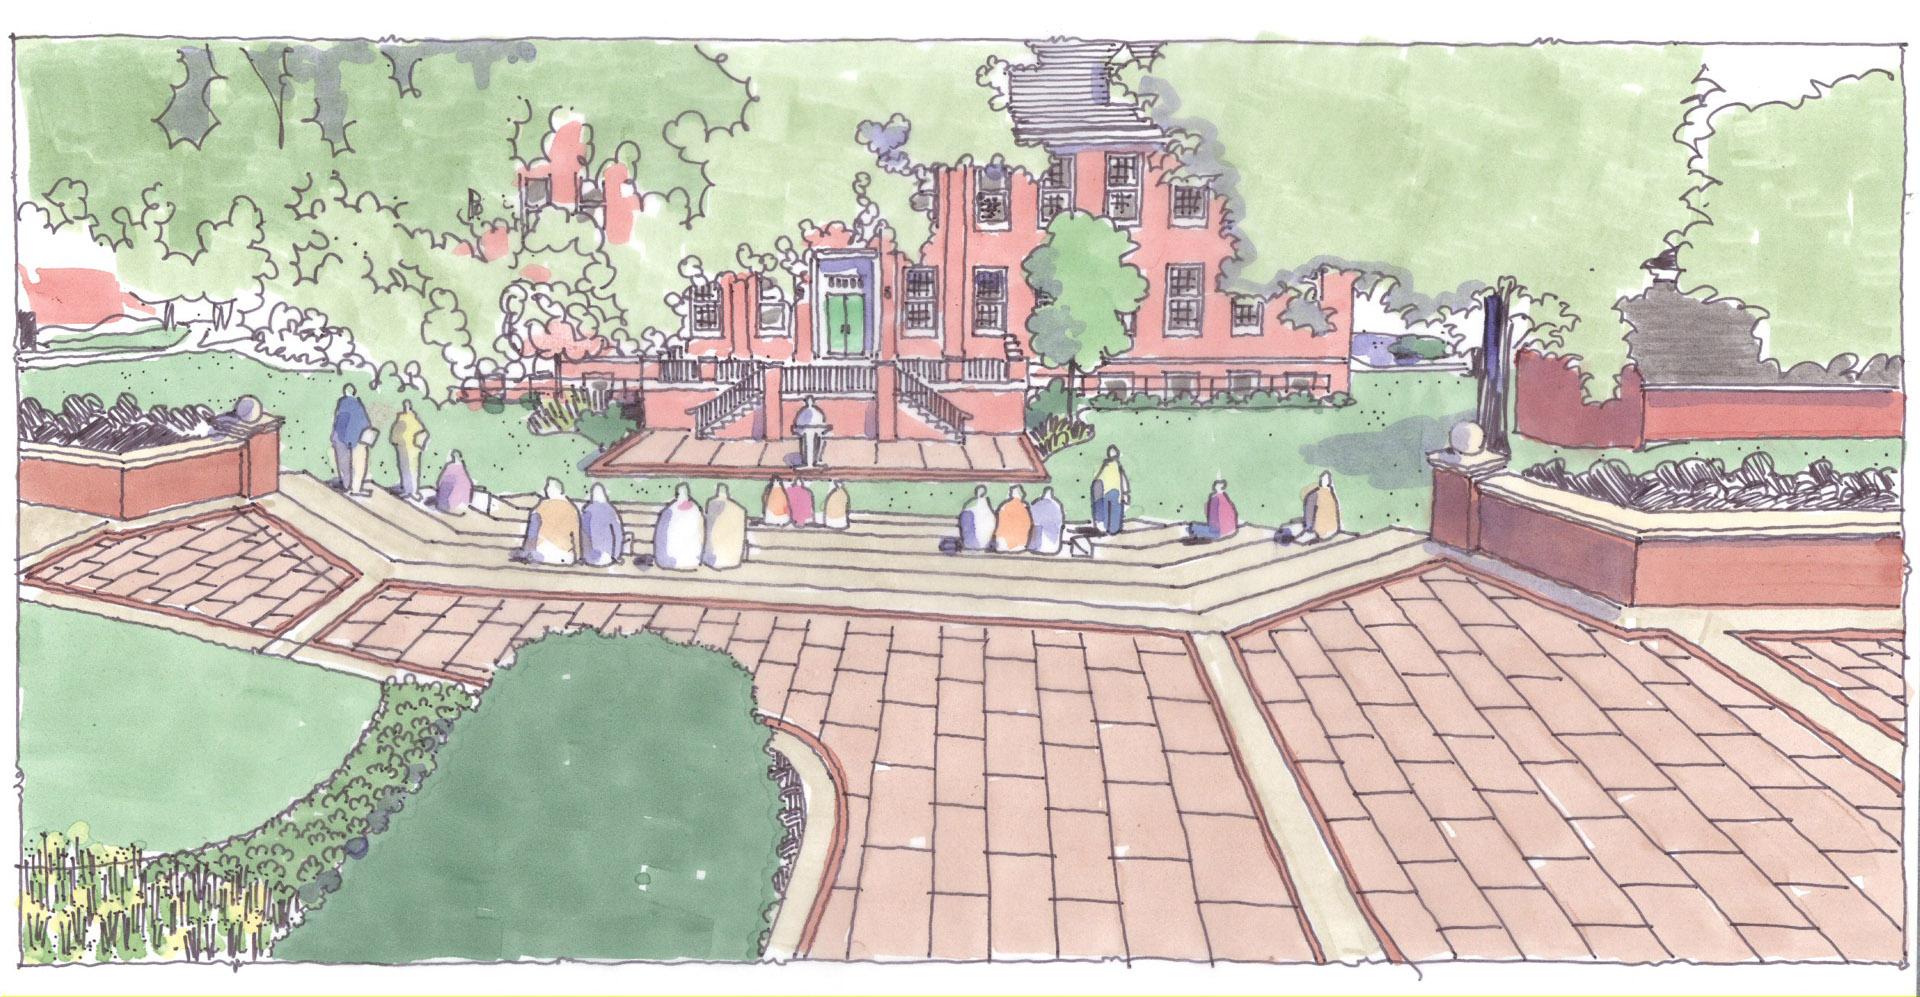 Allegheny College Landscape Master Plan - Derck & Edson